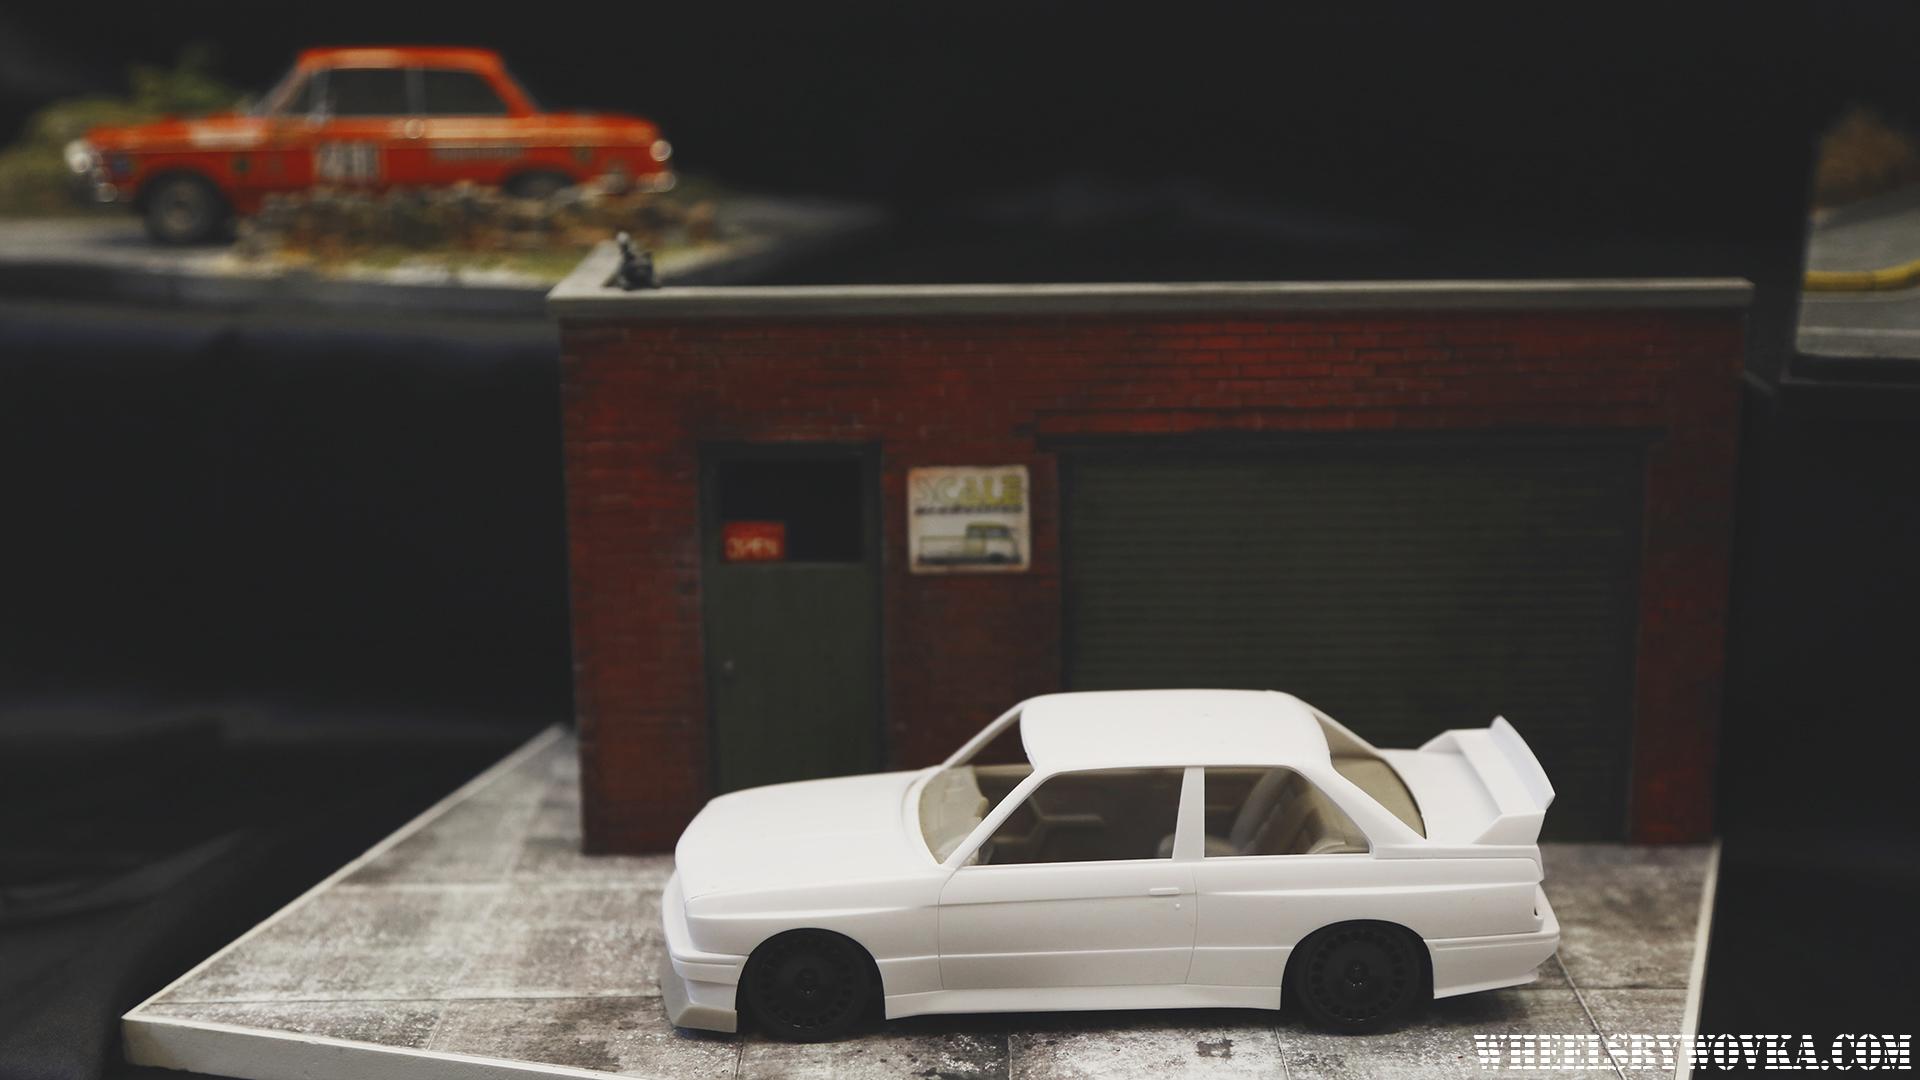 model-car-show-frankfurt-2017-41